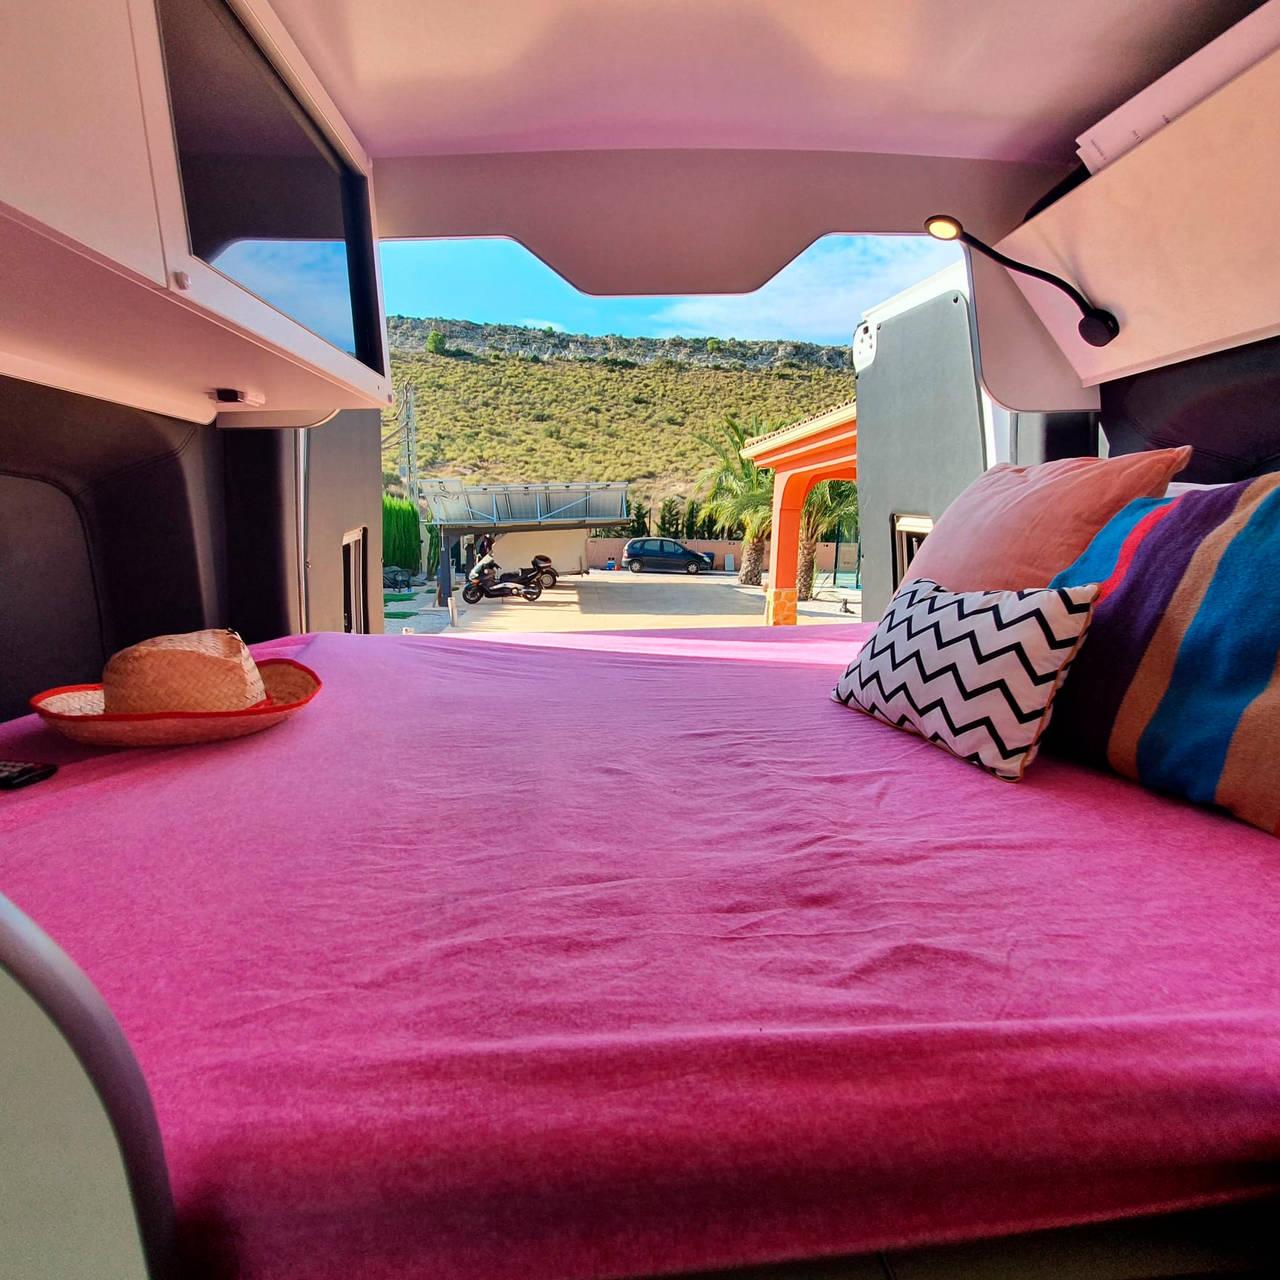 Alquiler furgoneta Camper en Alicante Mercedes  - Foto 8